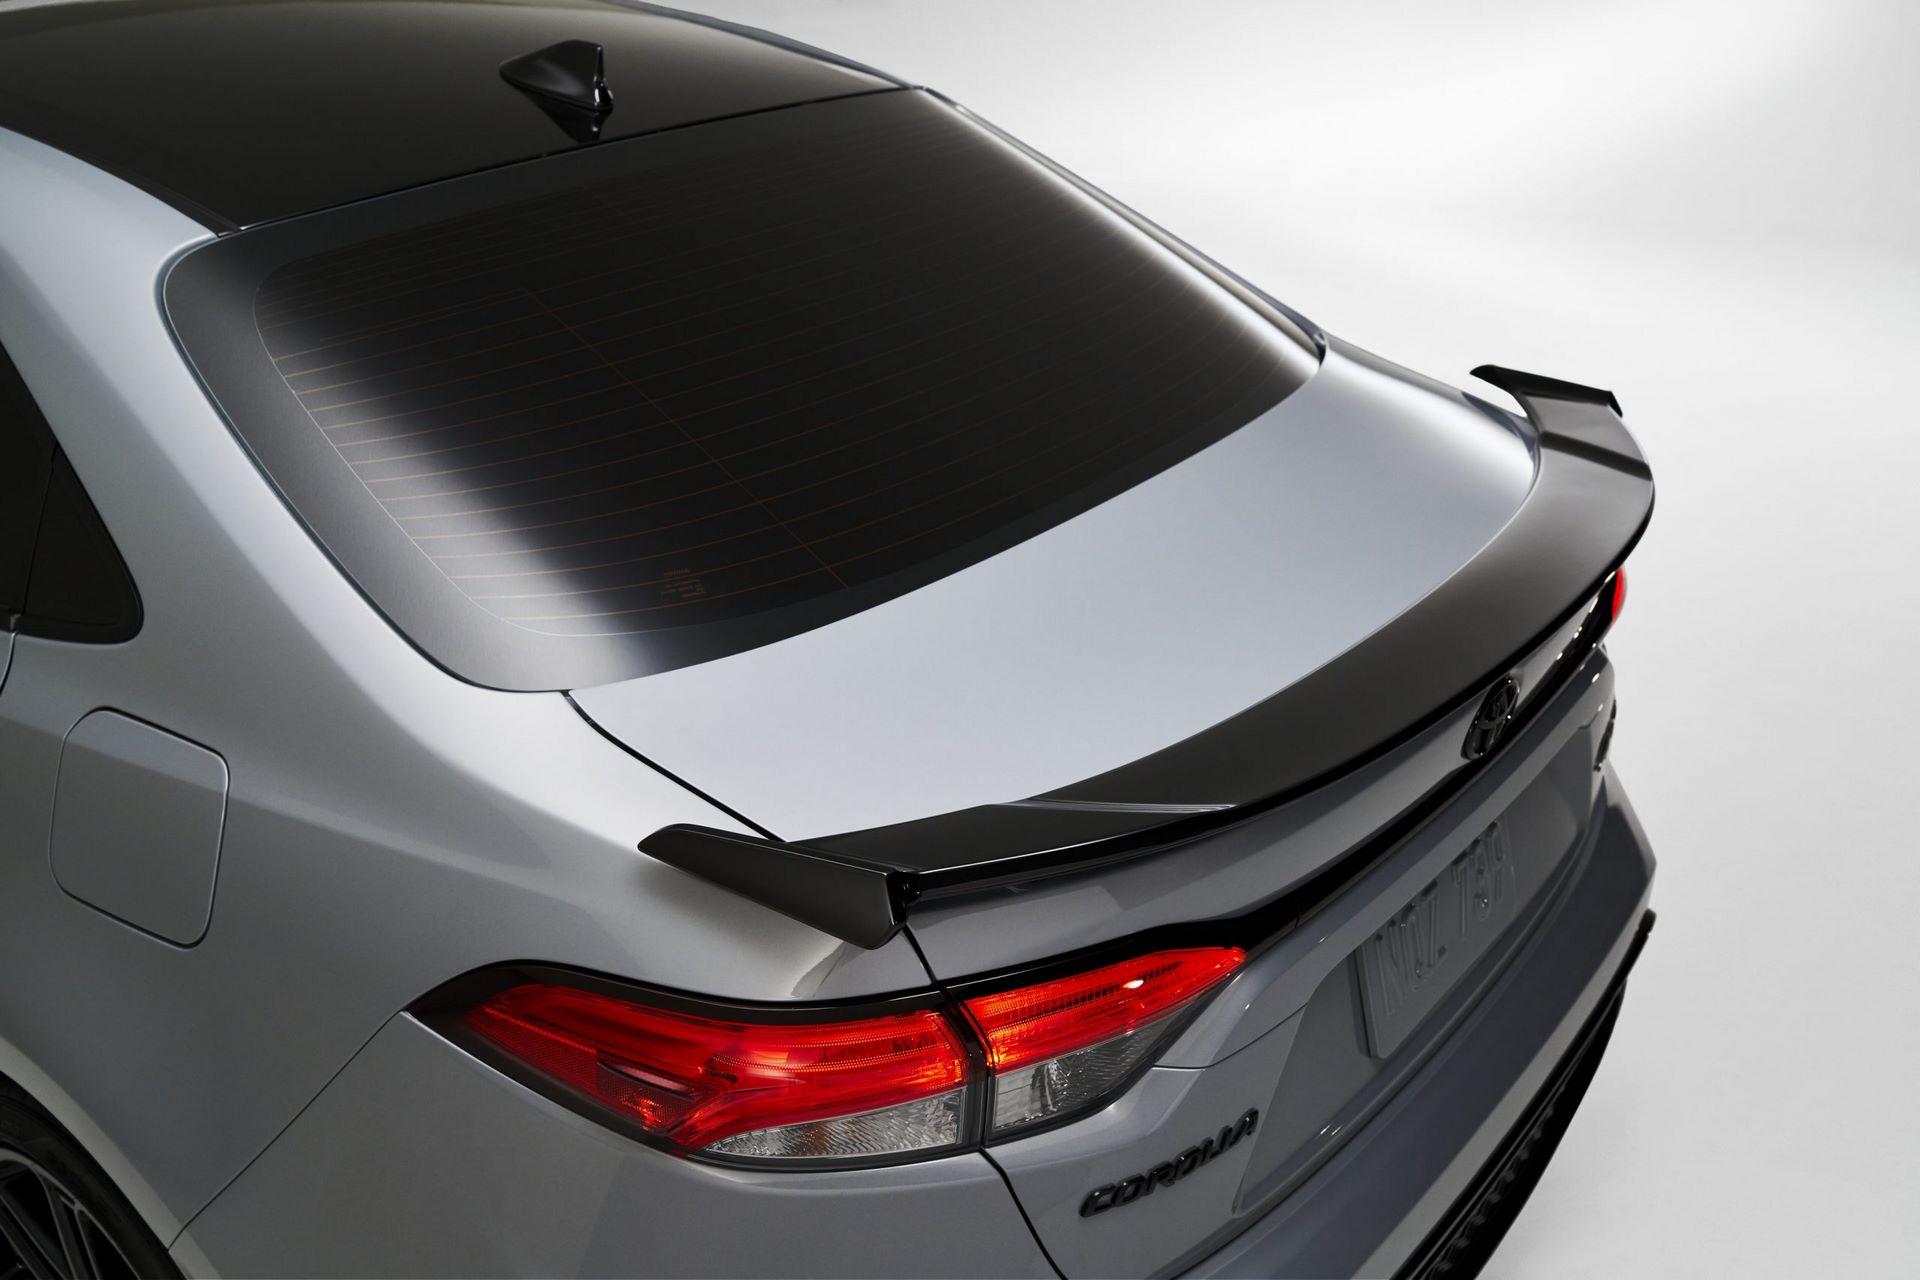 2021-Toyota-Corolla-Apex_004-scaled